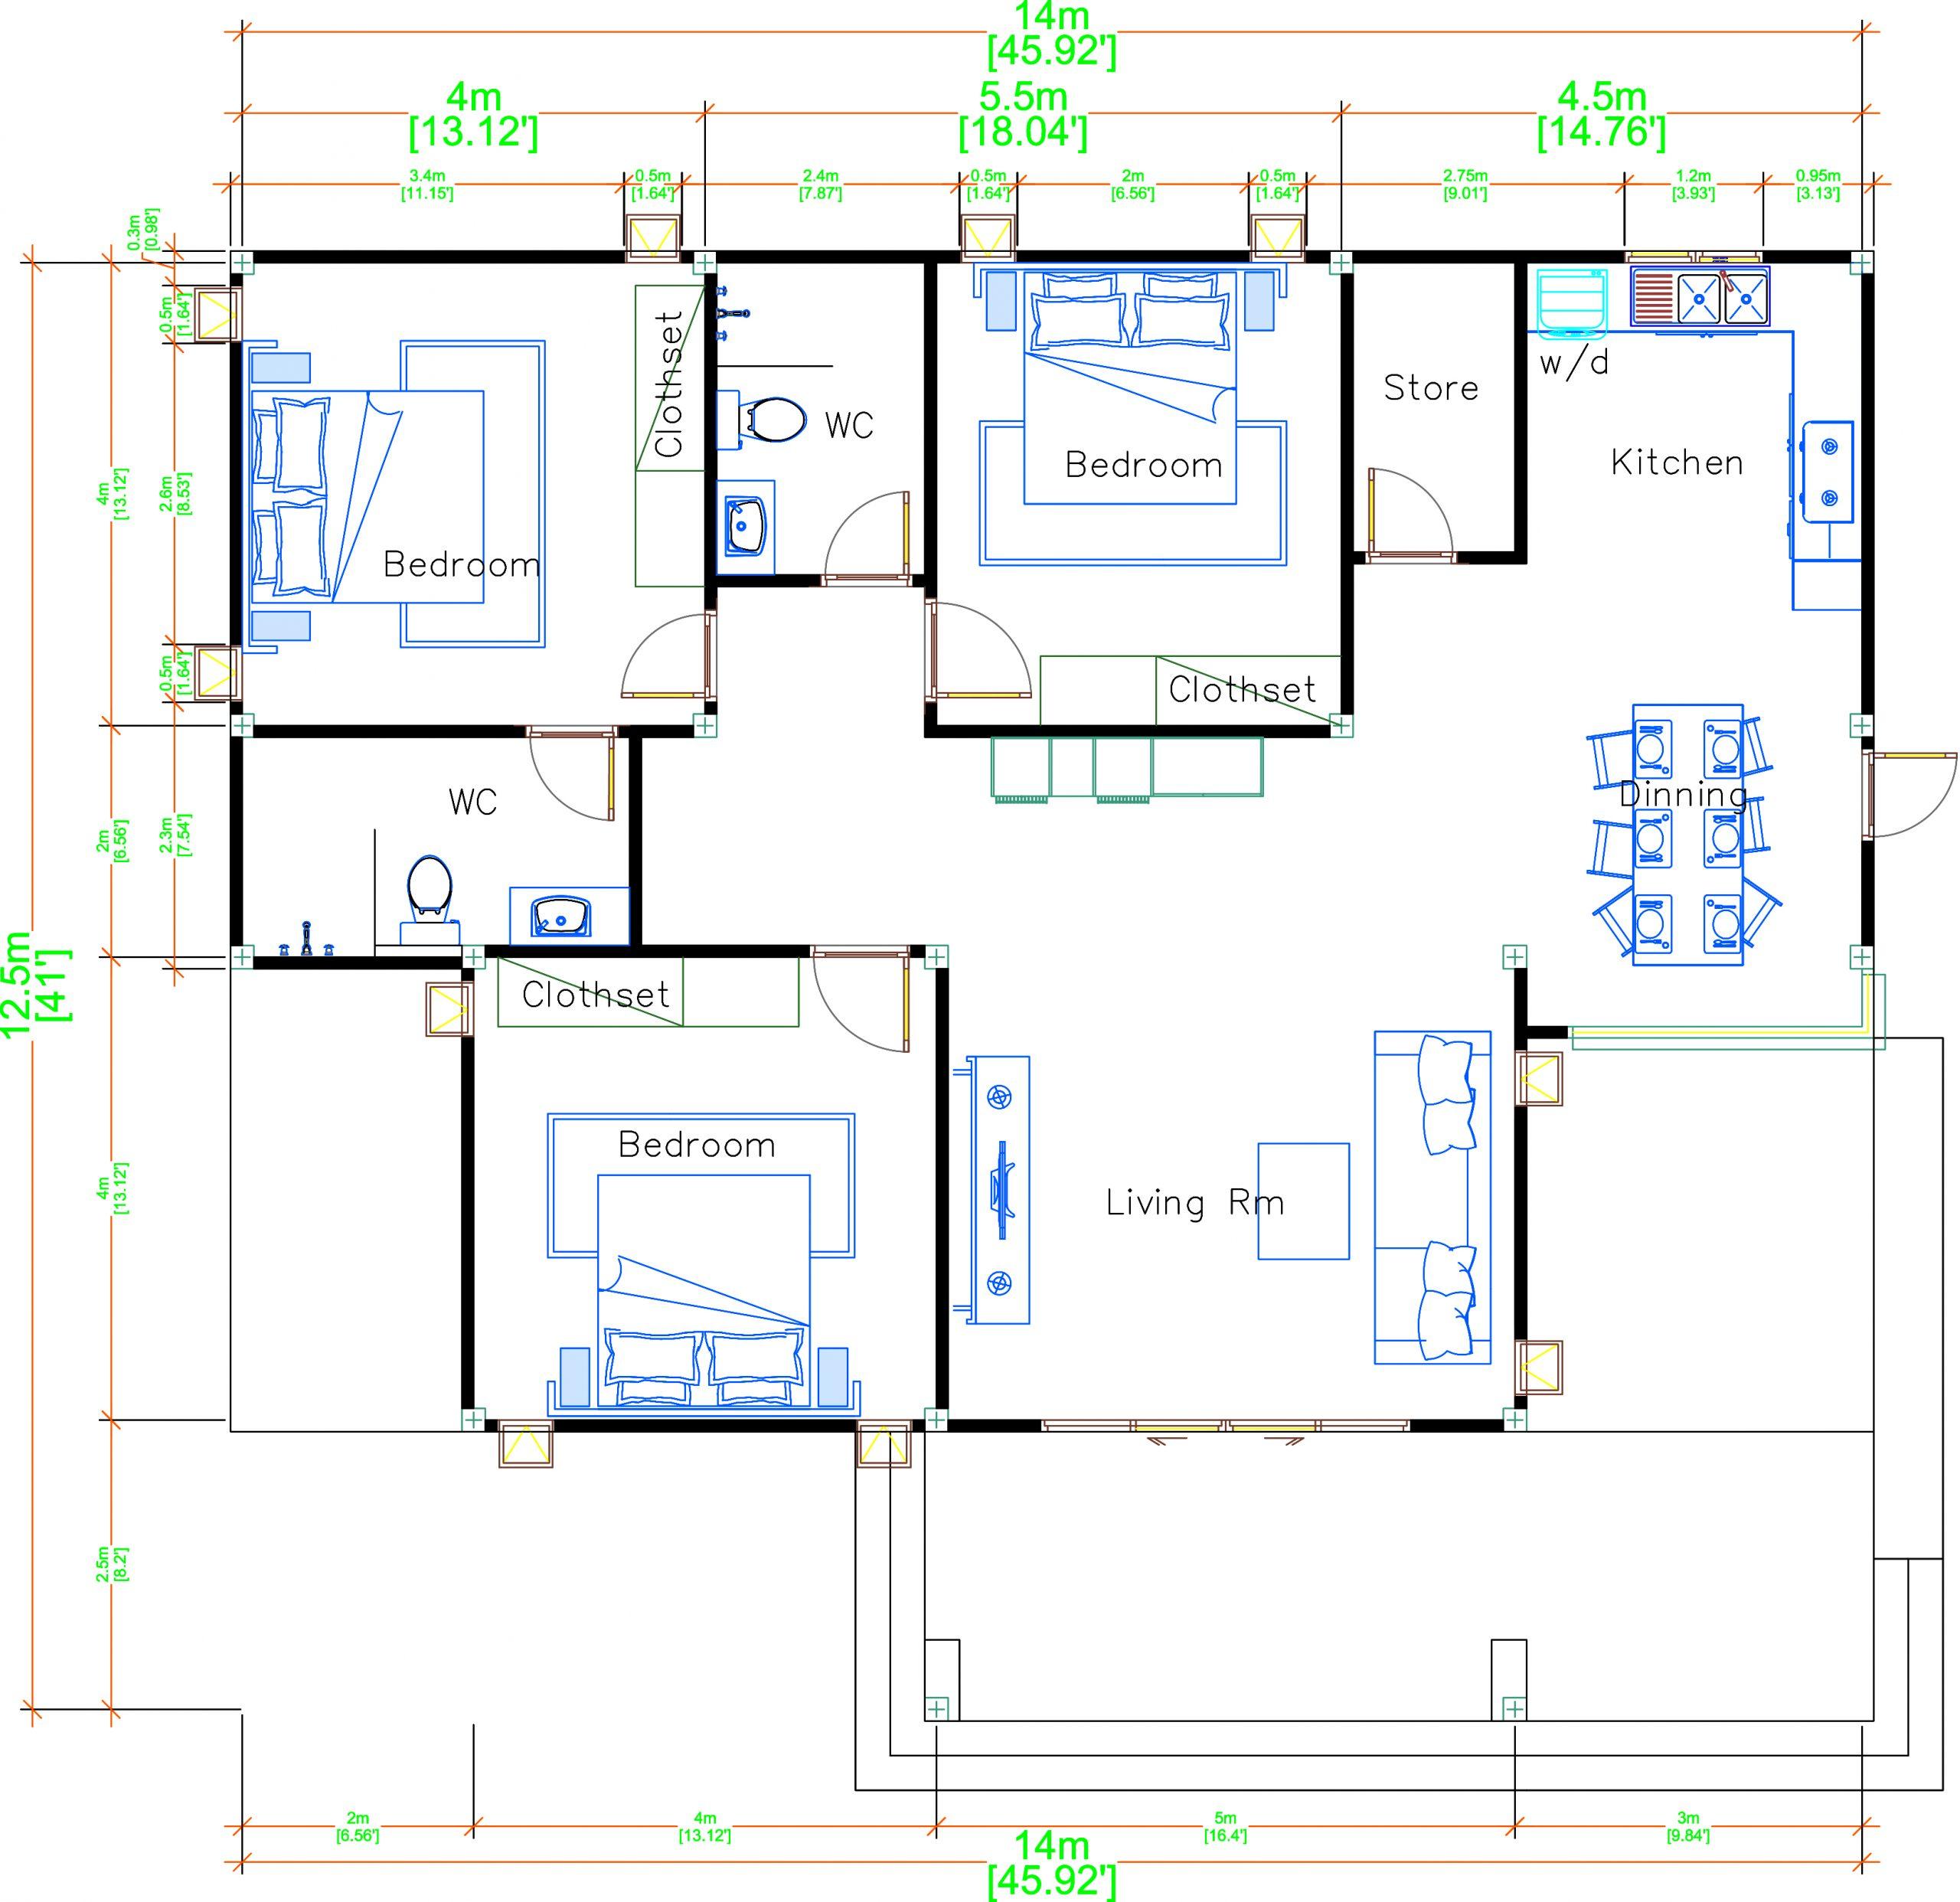 Modern Mansion Floor Plans 14x12.5 Meter 46x41 Feet 3 Beds layout floor plan